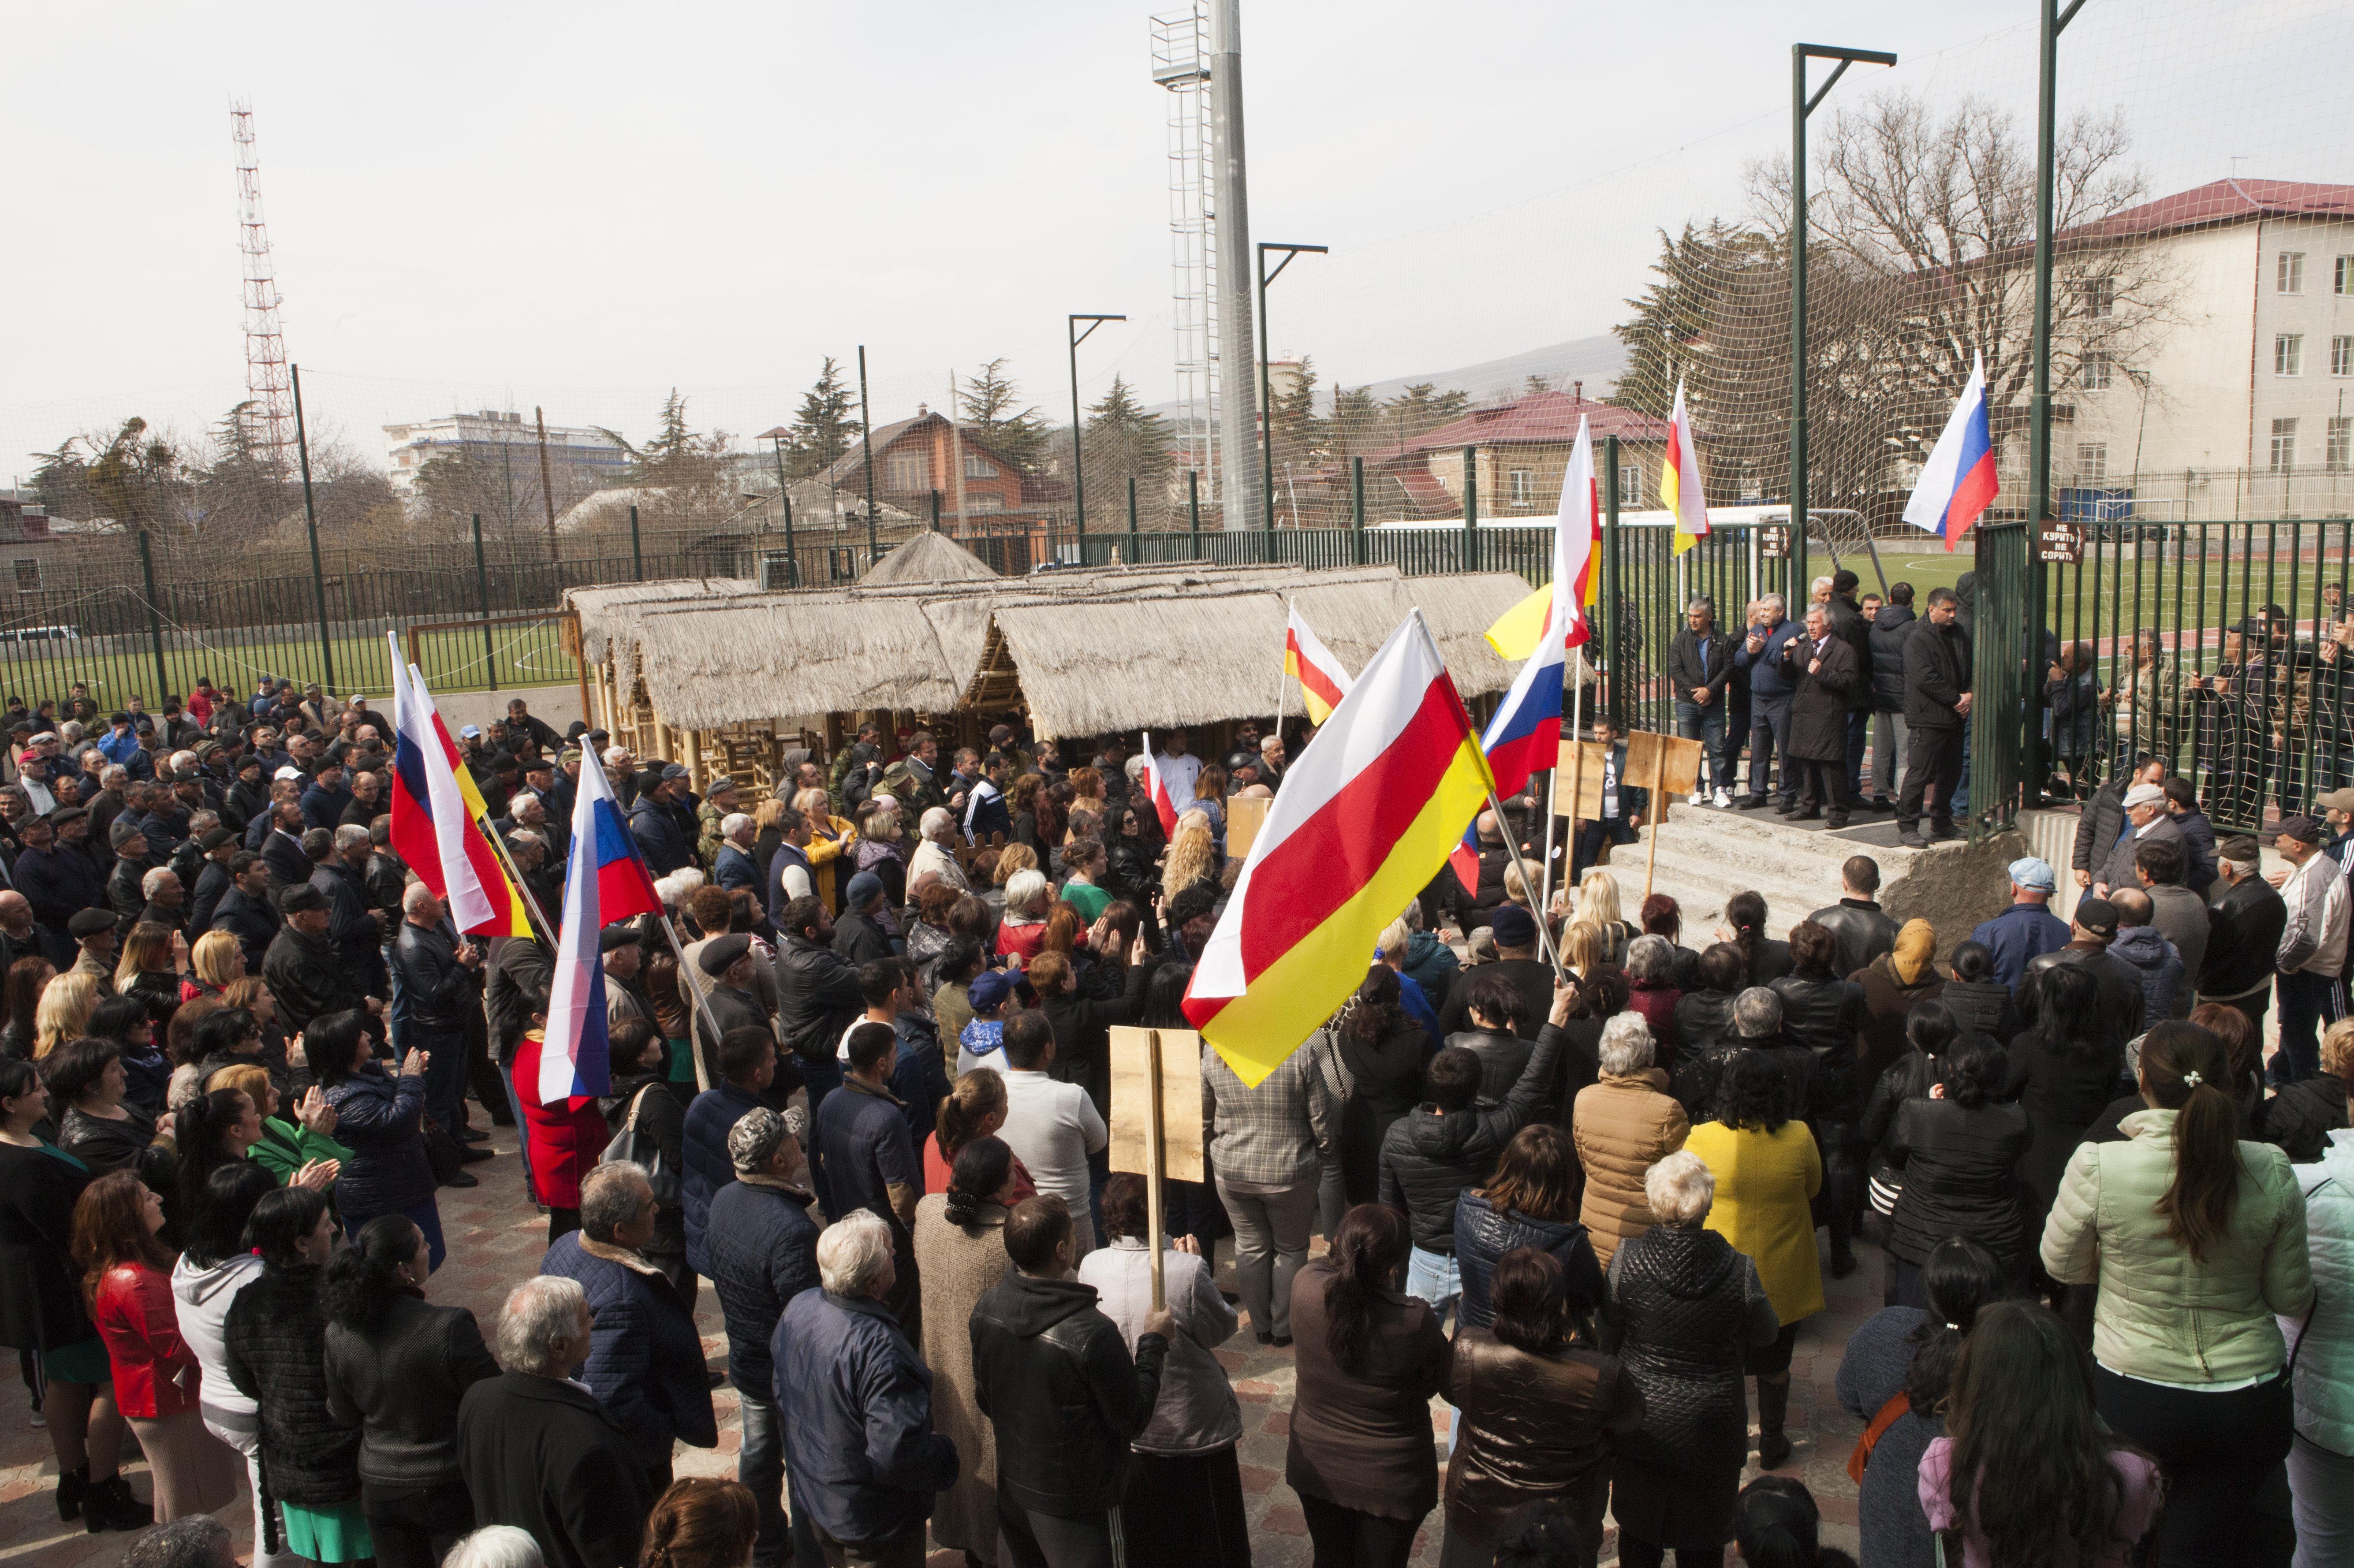 Сторонники экс-президента Эдуарда Кокойты собрались на митинг